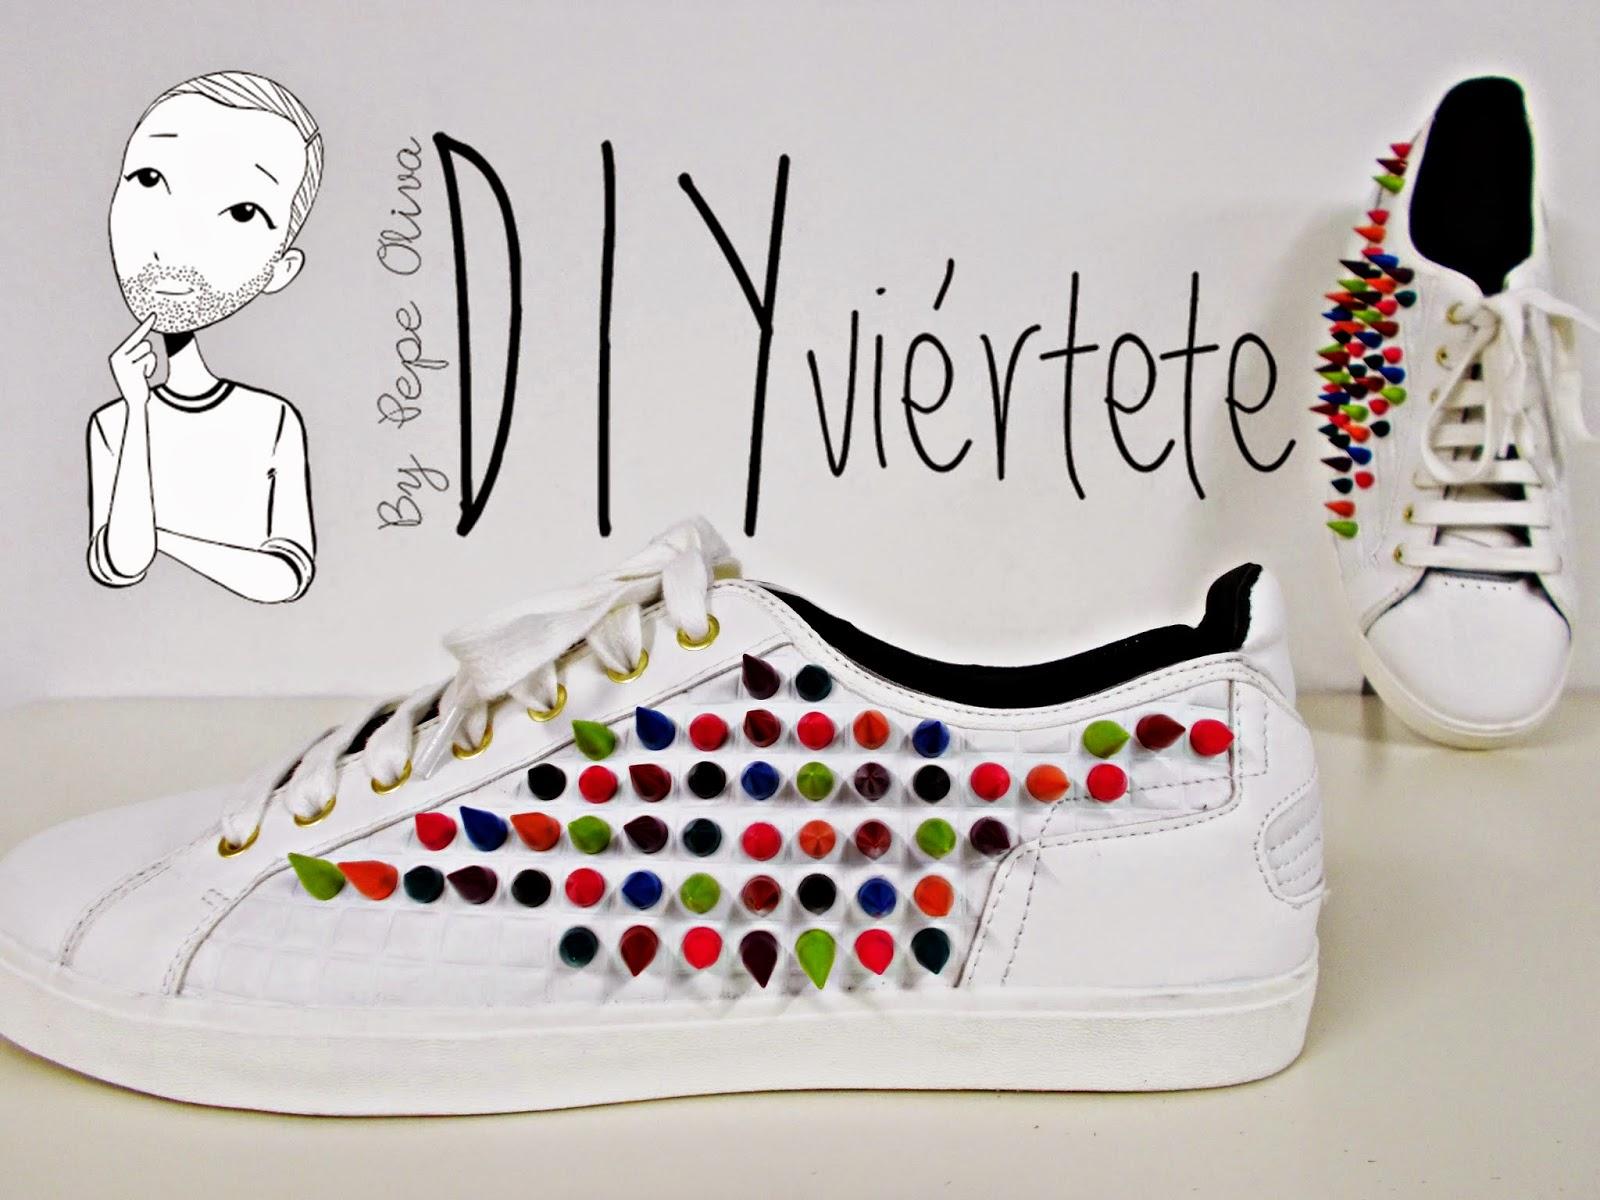 DIY-zapatillas-tunear-customizar-CHRISTIAN-LOUBOUTIN-zapatos-pinchos-esmaltes-pinta uñas-colores-2